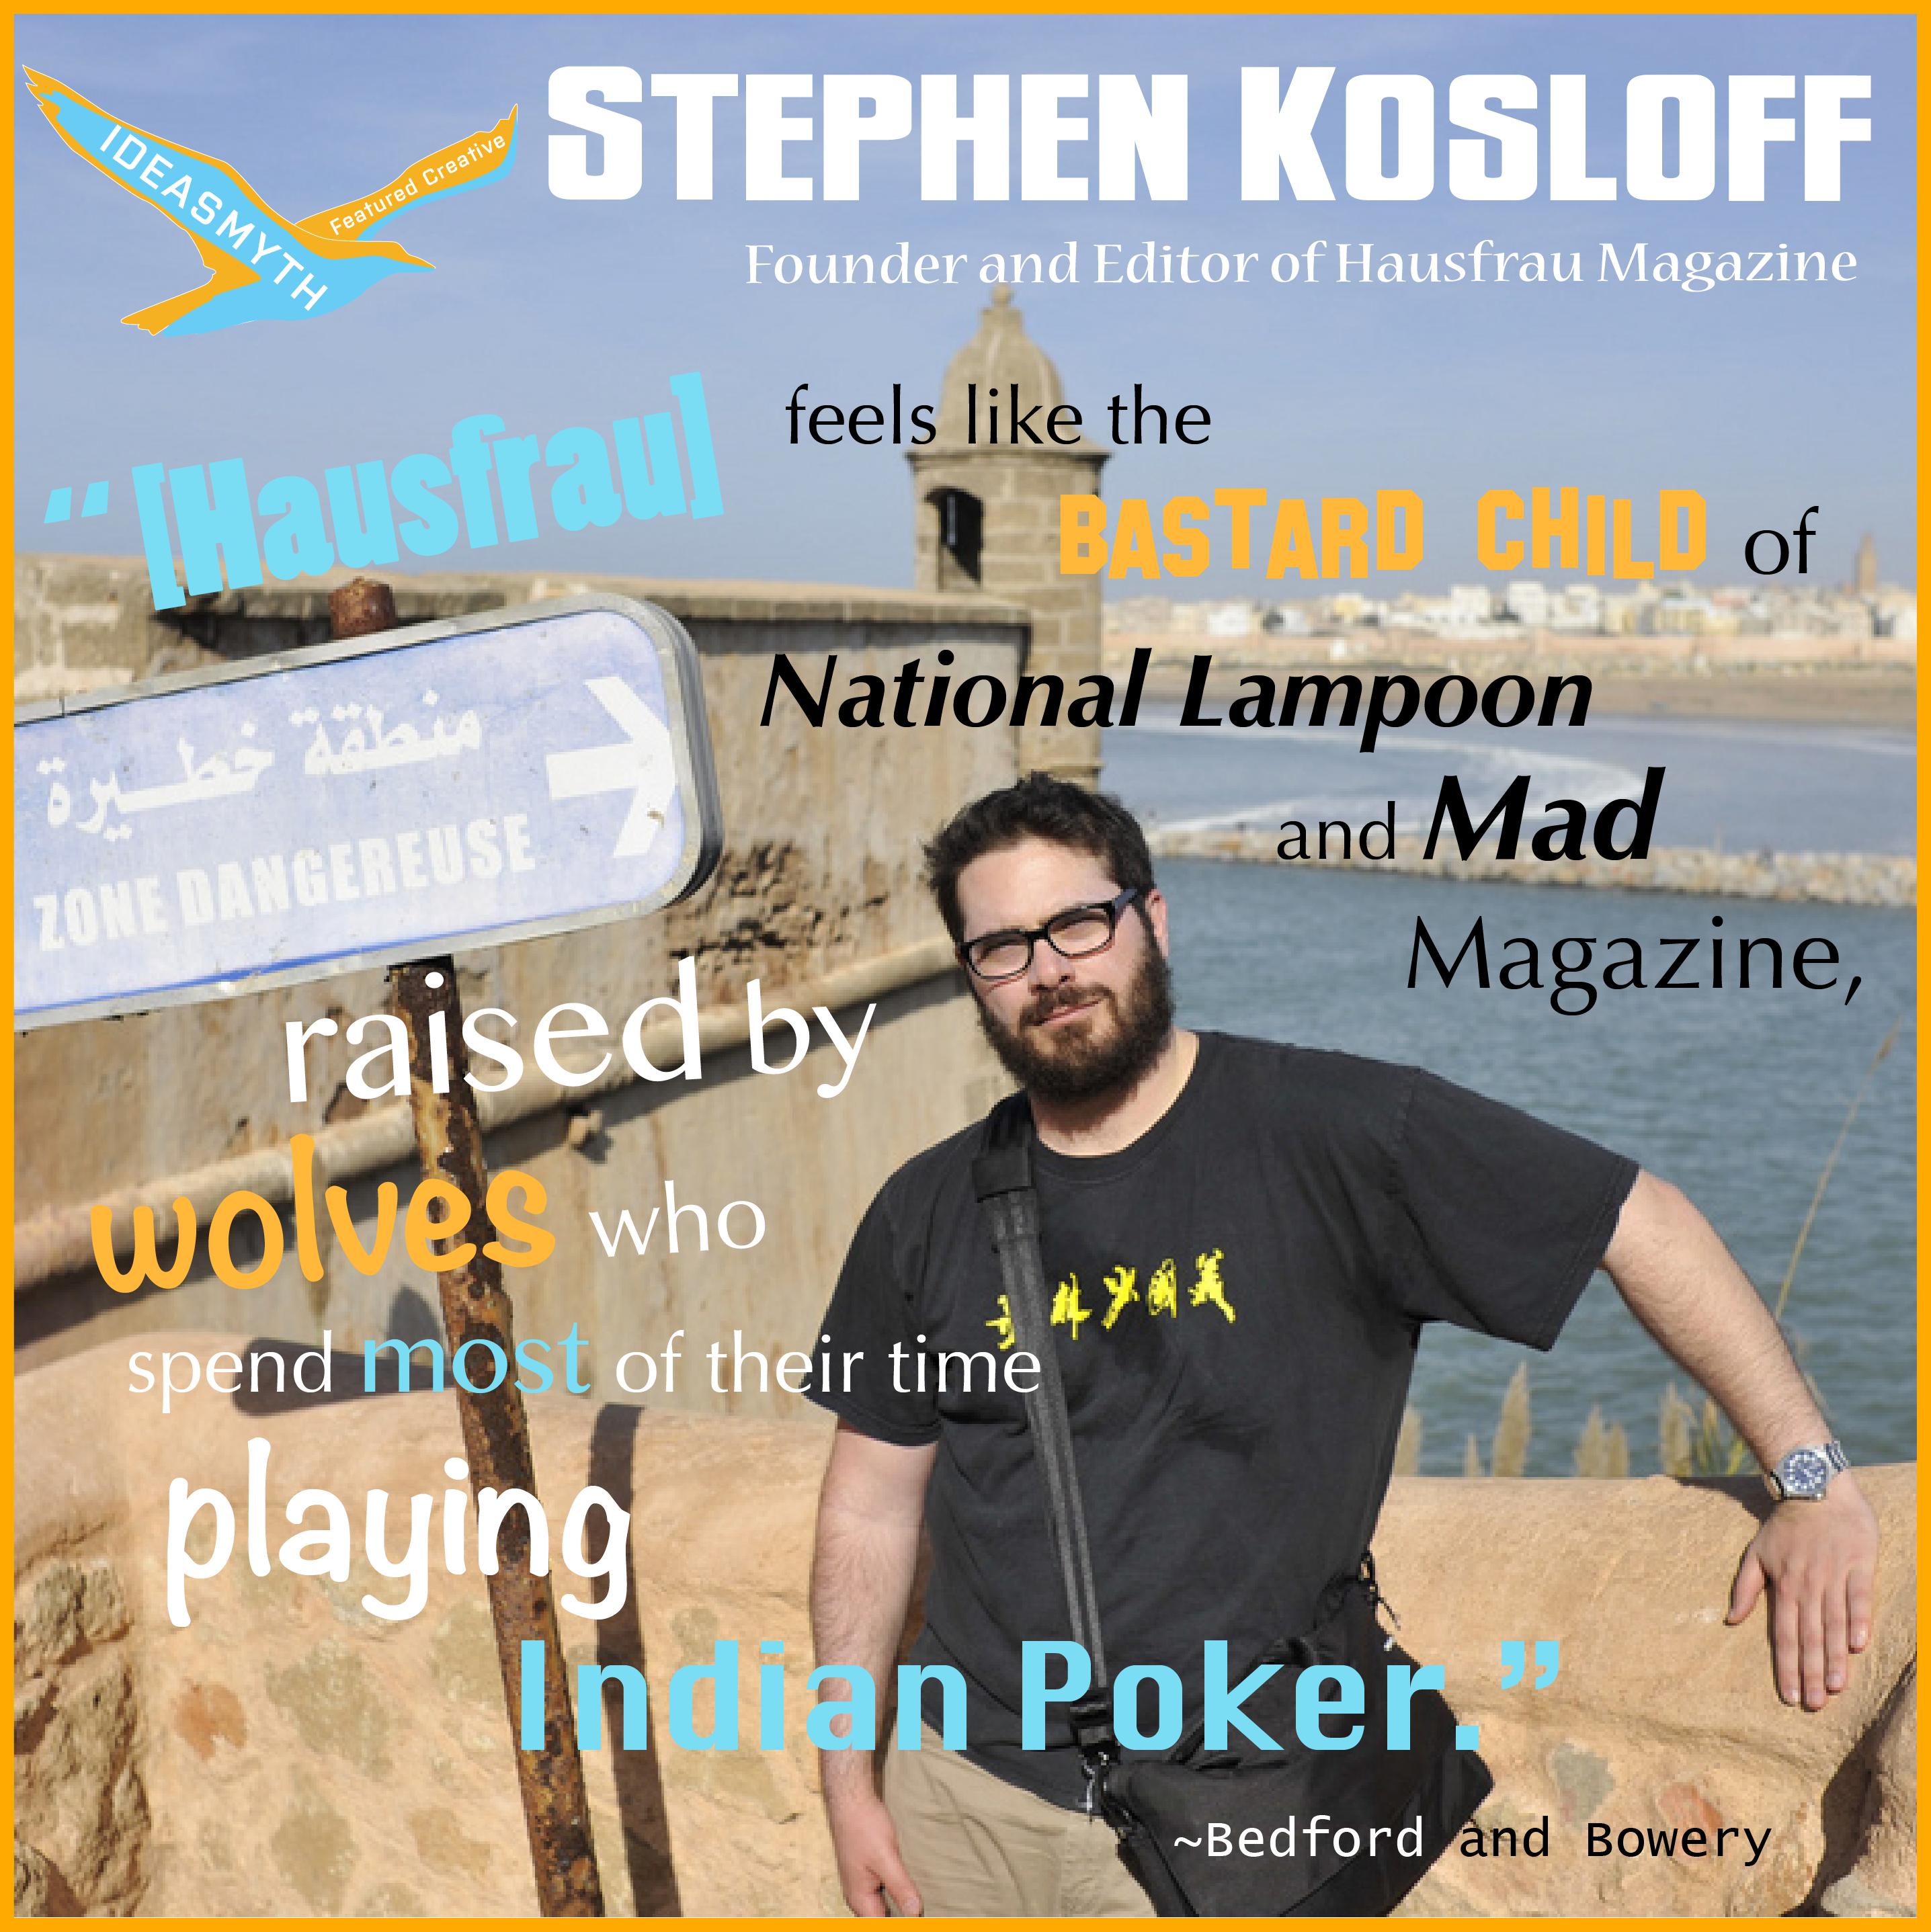 Stephen Kosloff